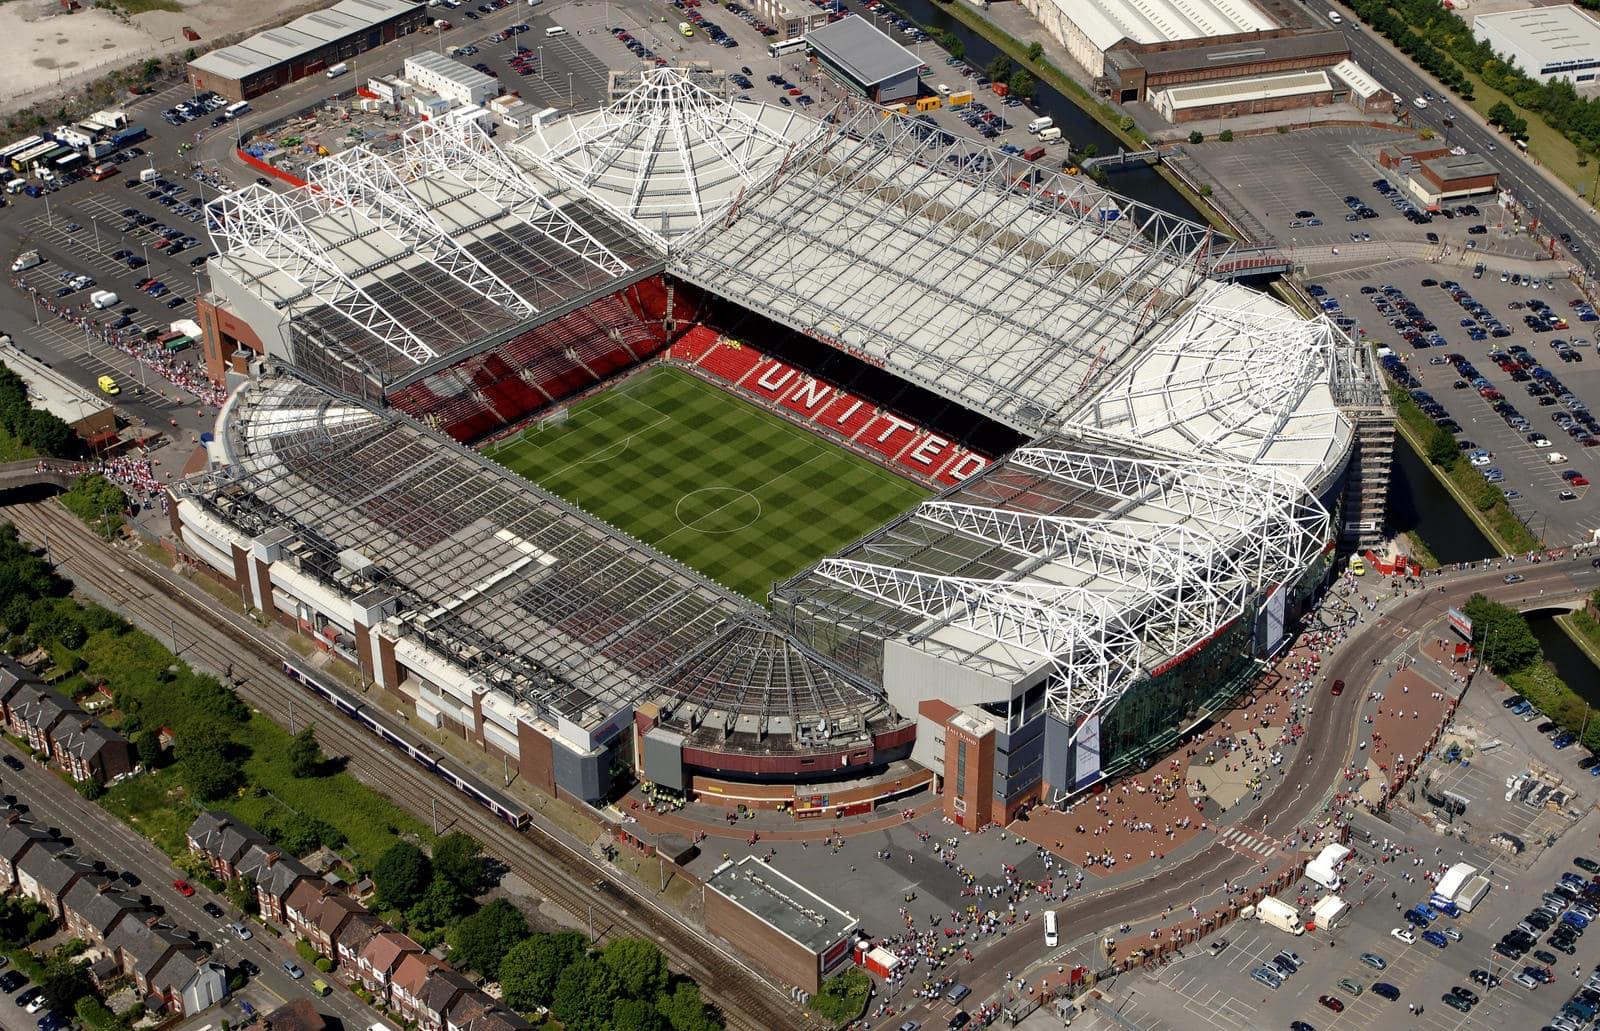 Old Trafford Football Ground